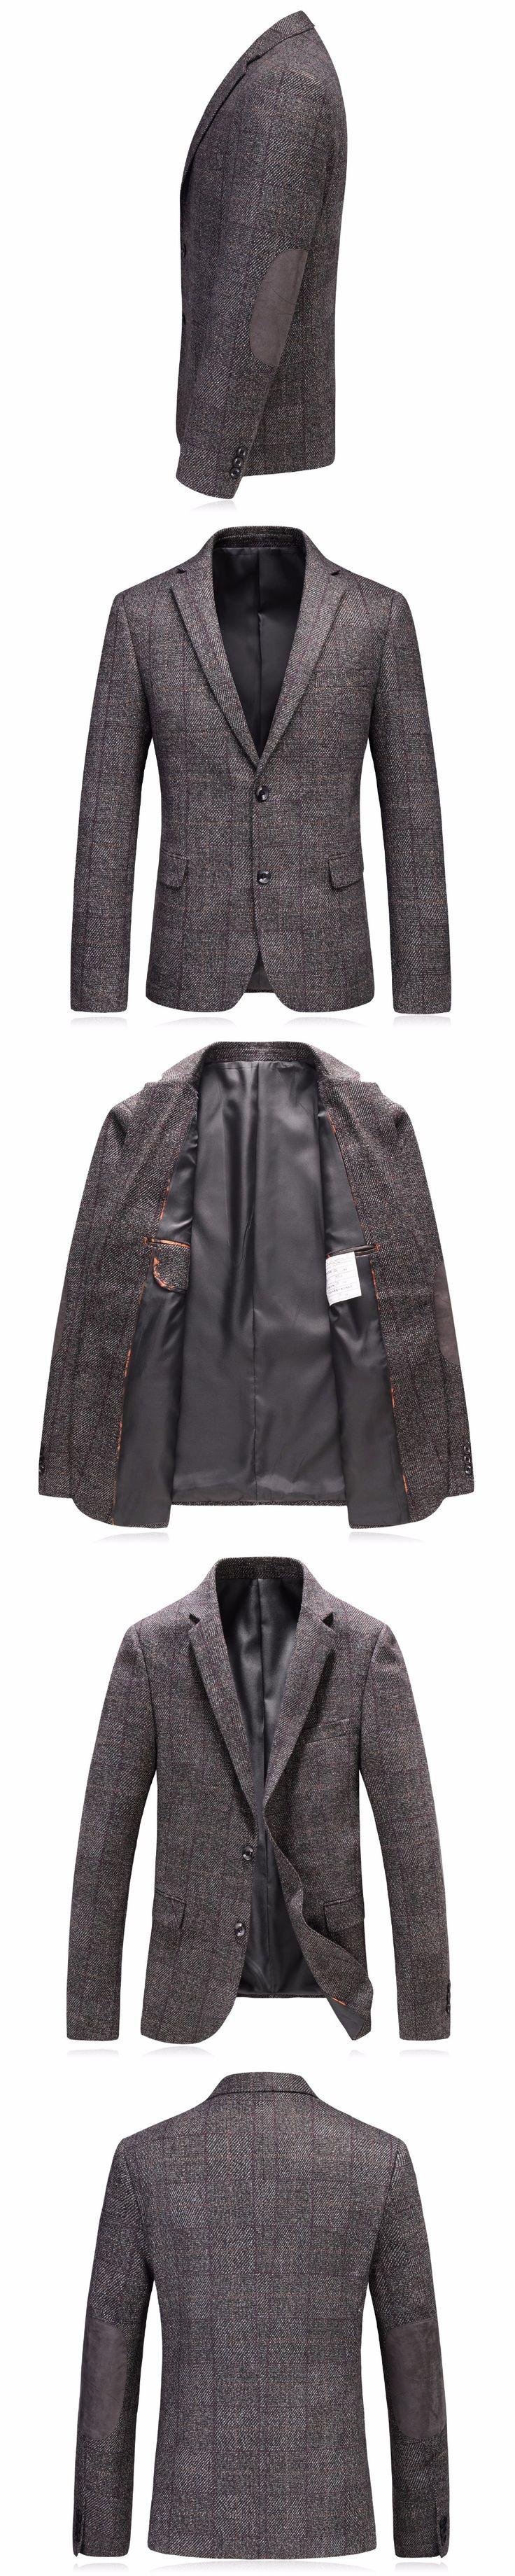 Mens Tweed Jacket 2017 Luxury Plaid Suit Blazers Male High Quality Stylish Tweed Jacket Men Casual Blazer Slim Fit Costume M-3XL